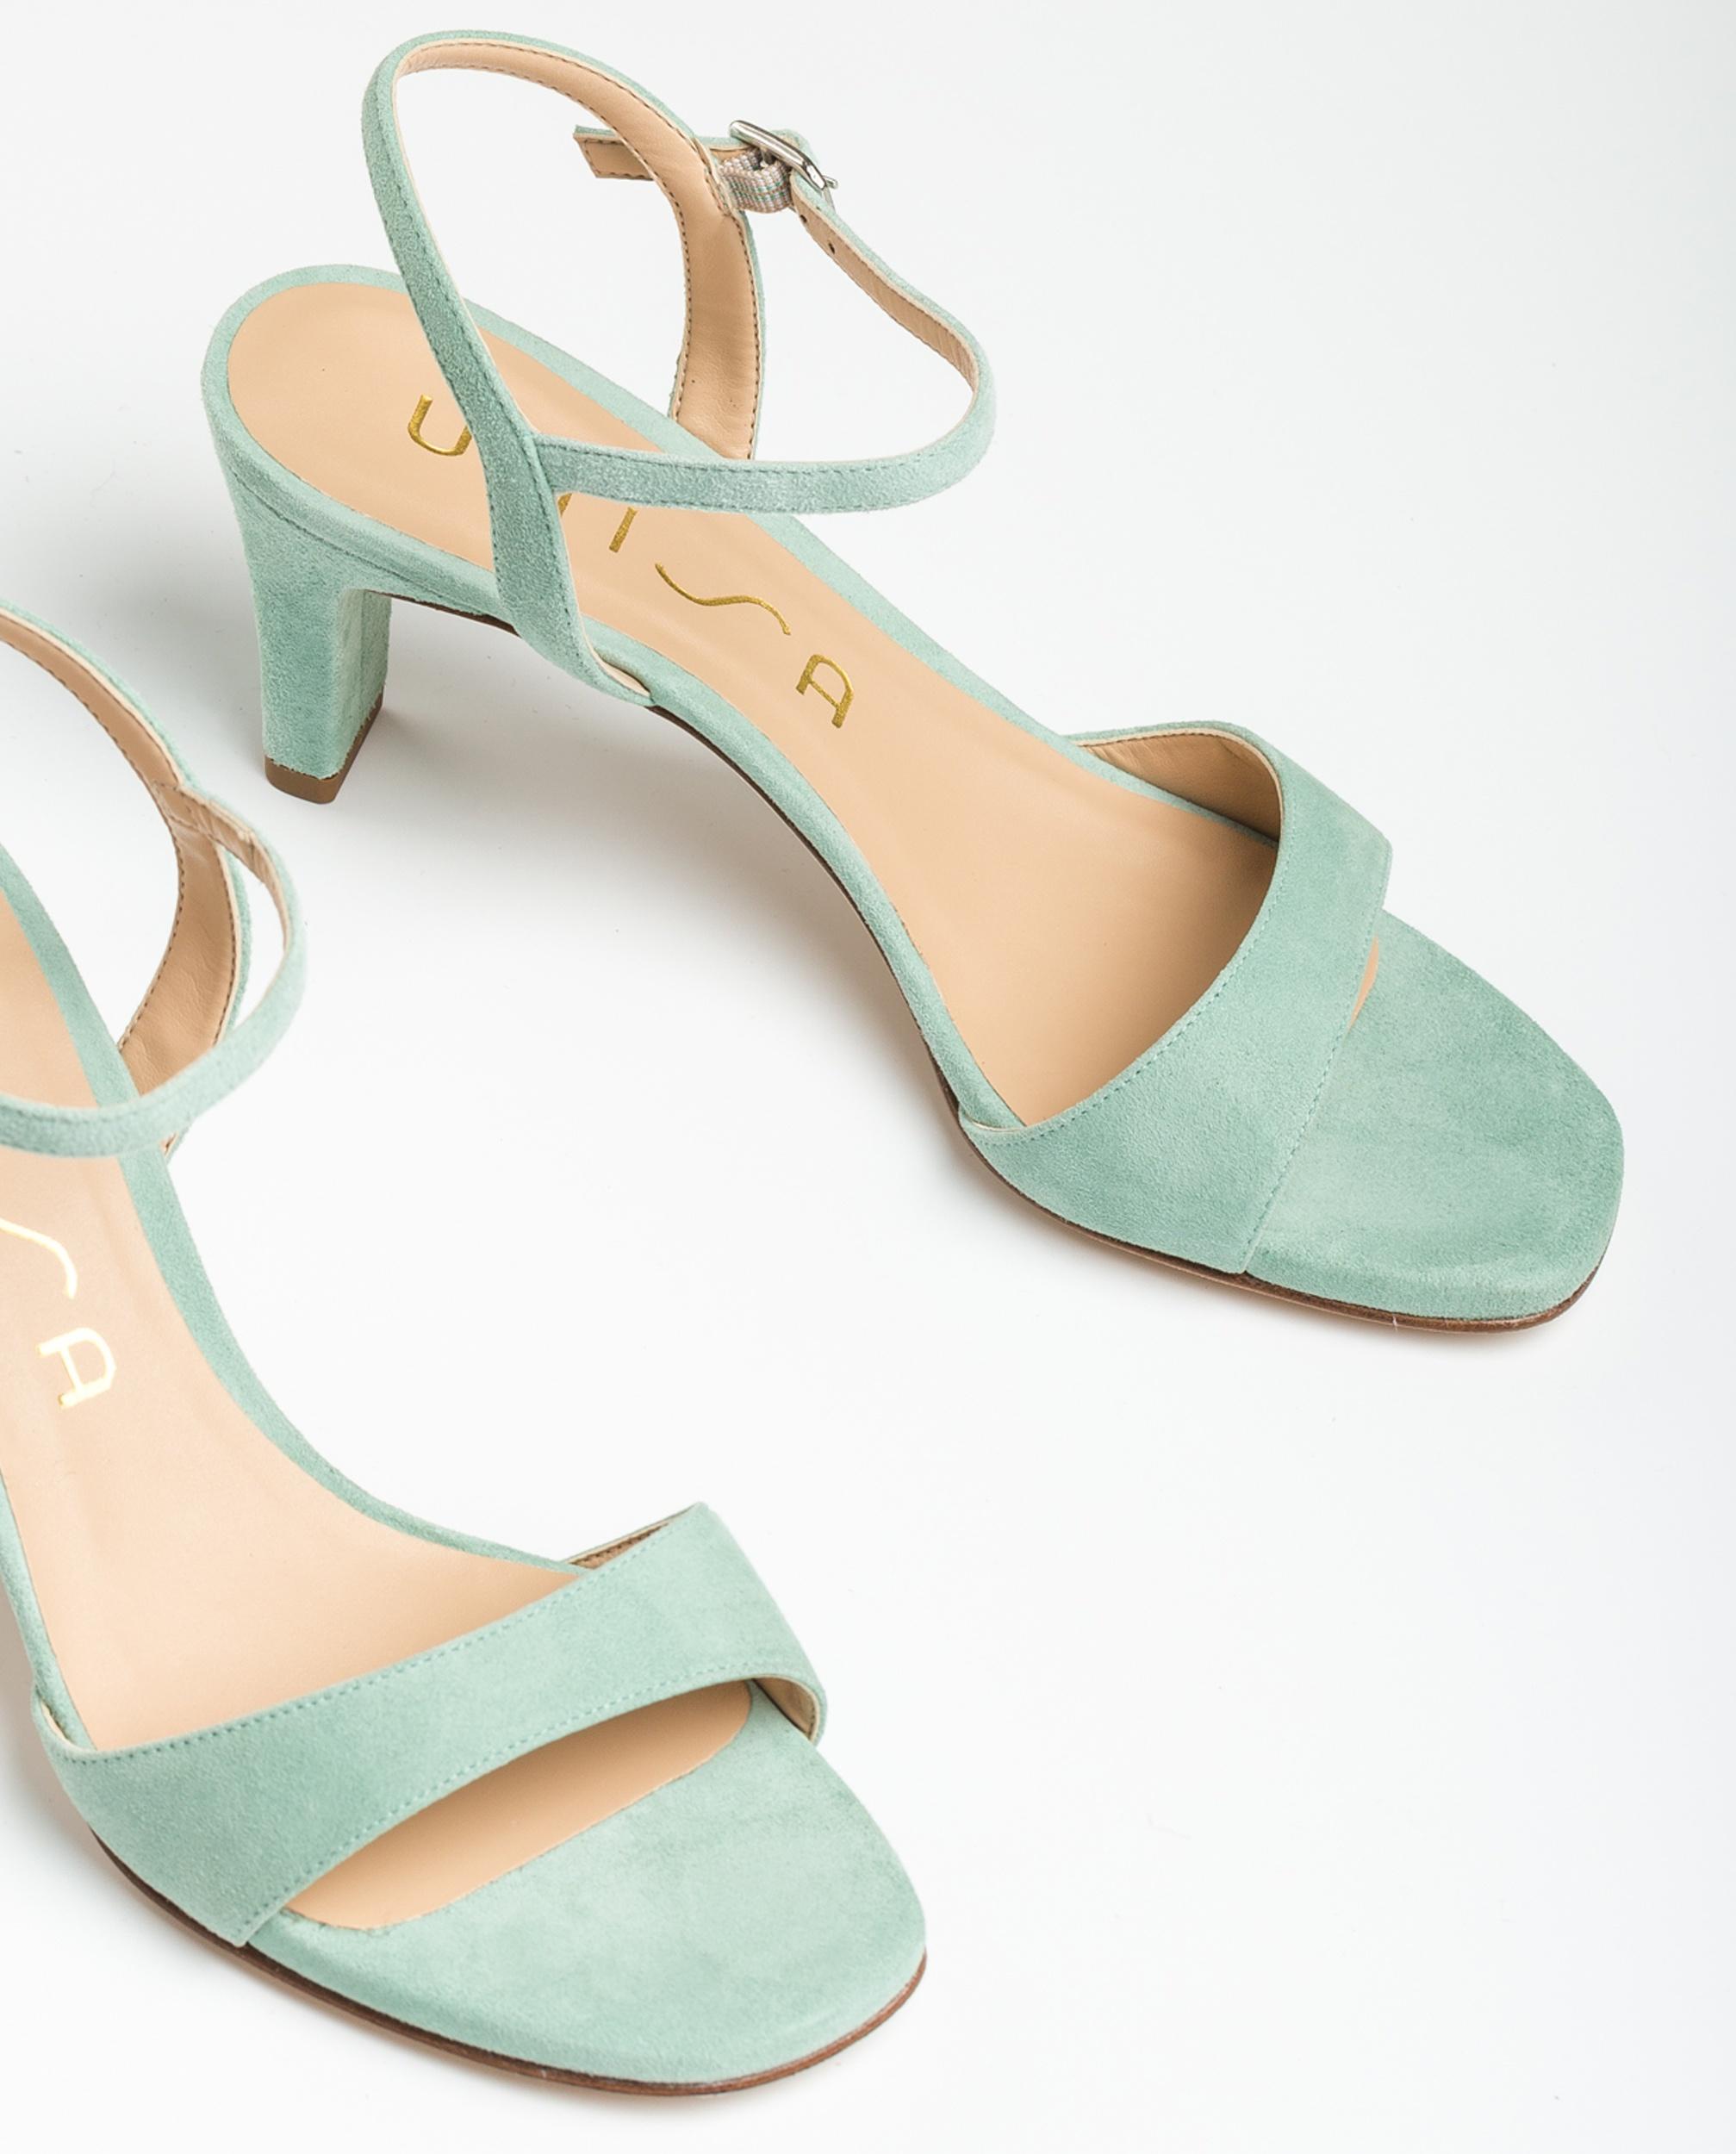 UNISA Kid suede sandals medium heel MECHI_KS mint 2